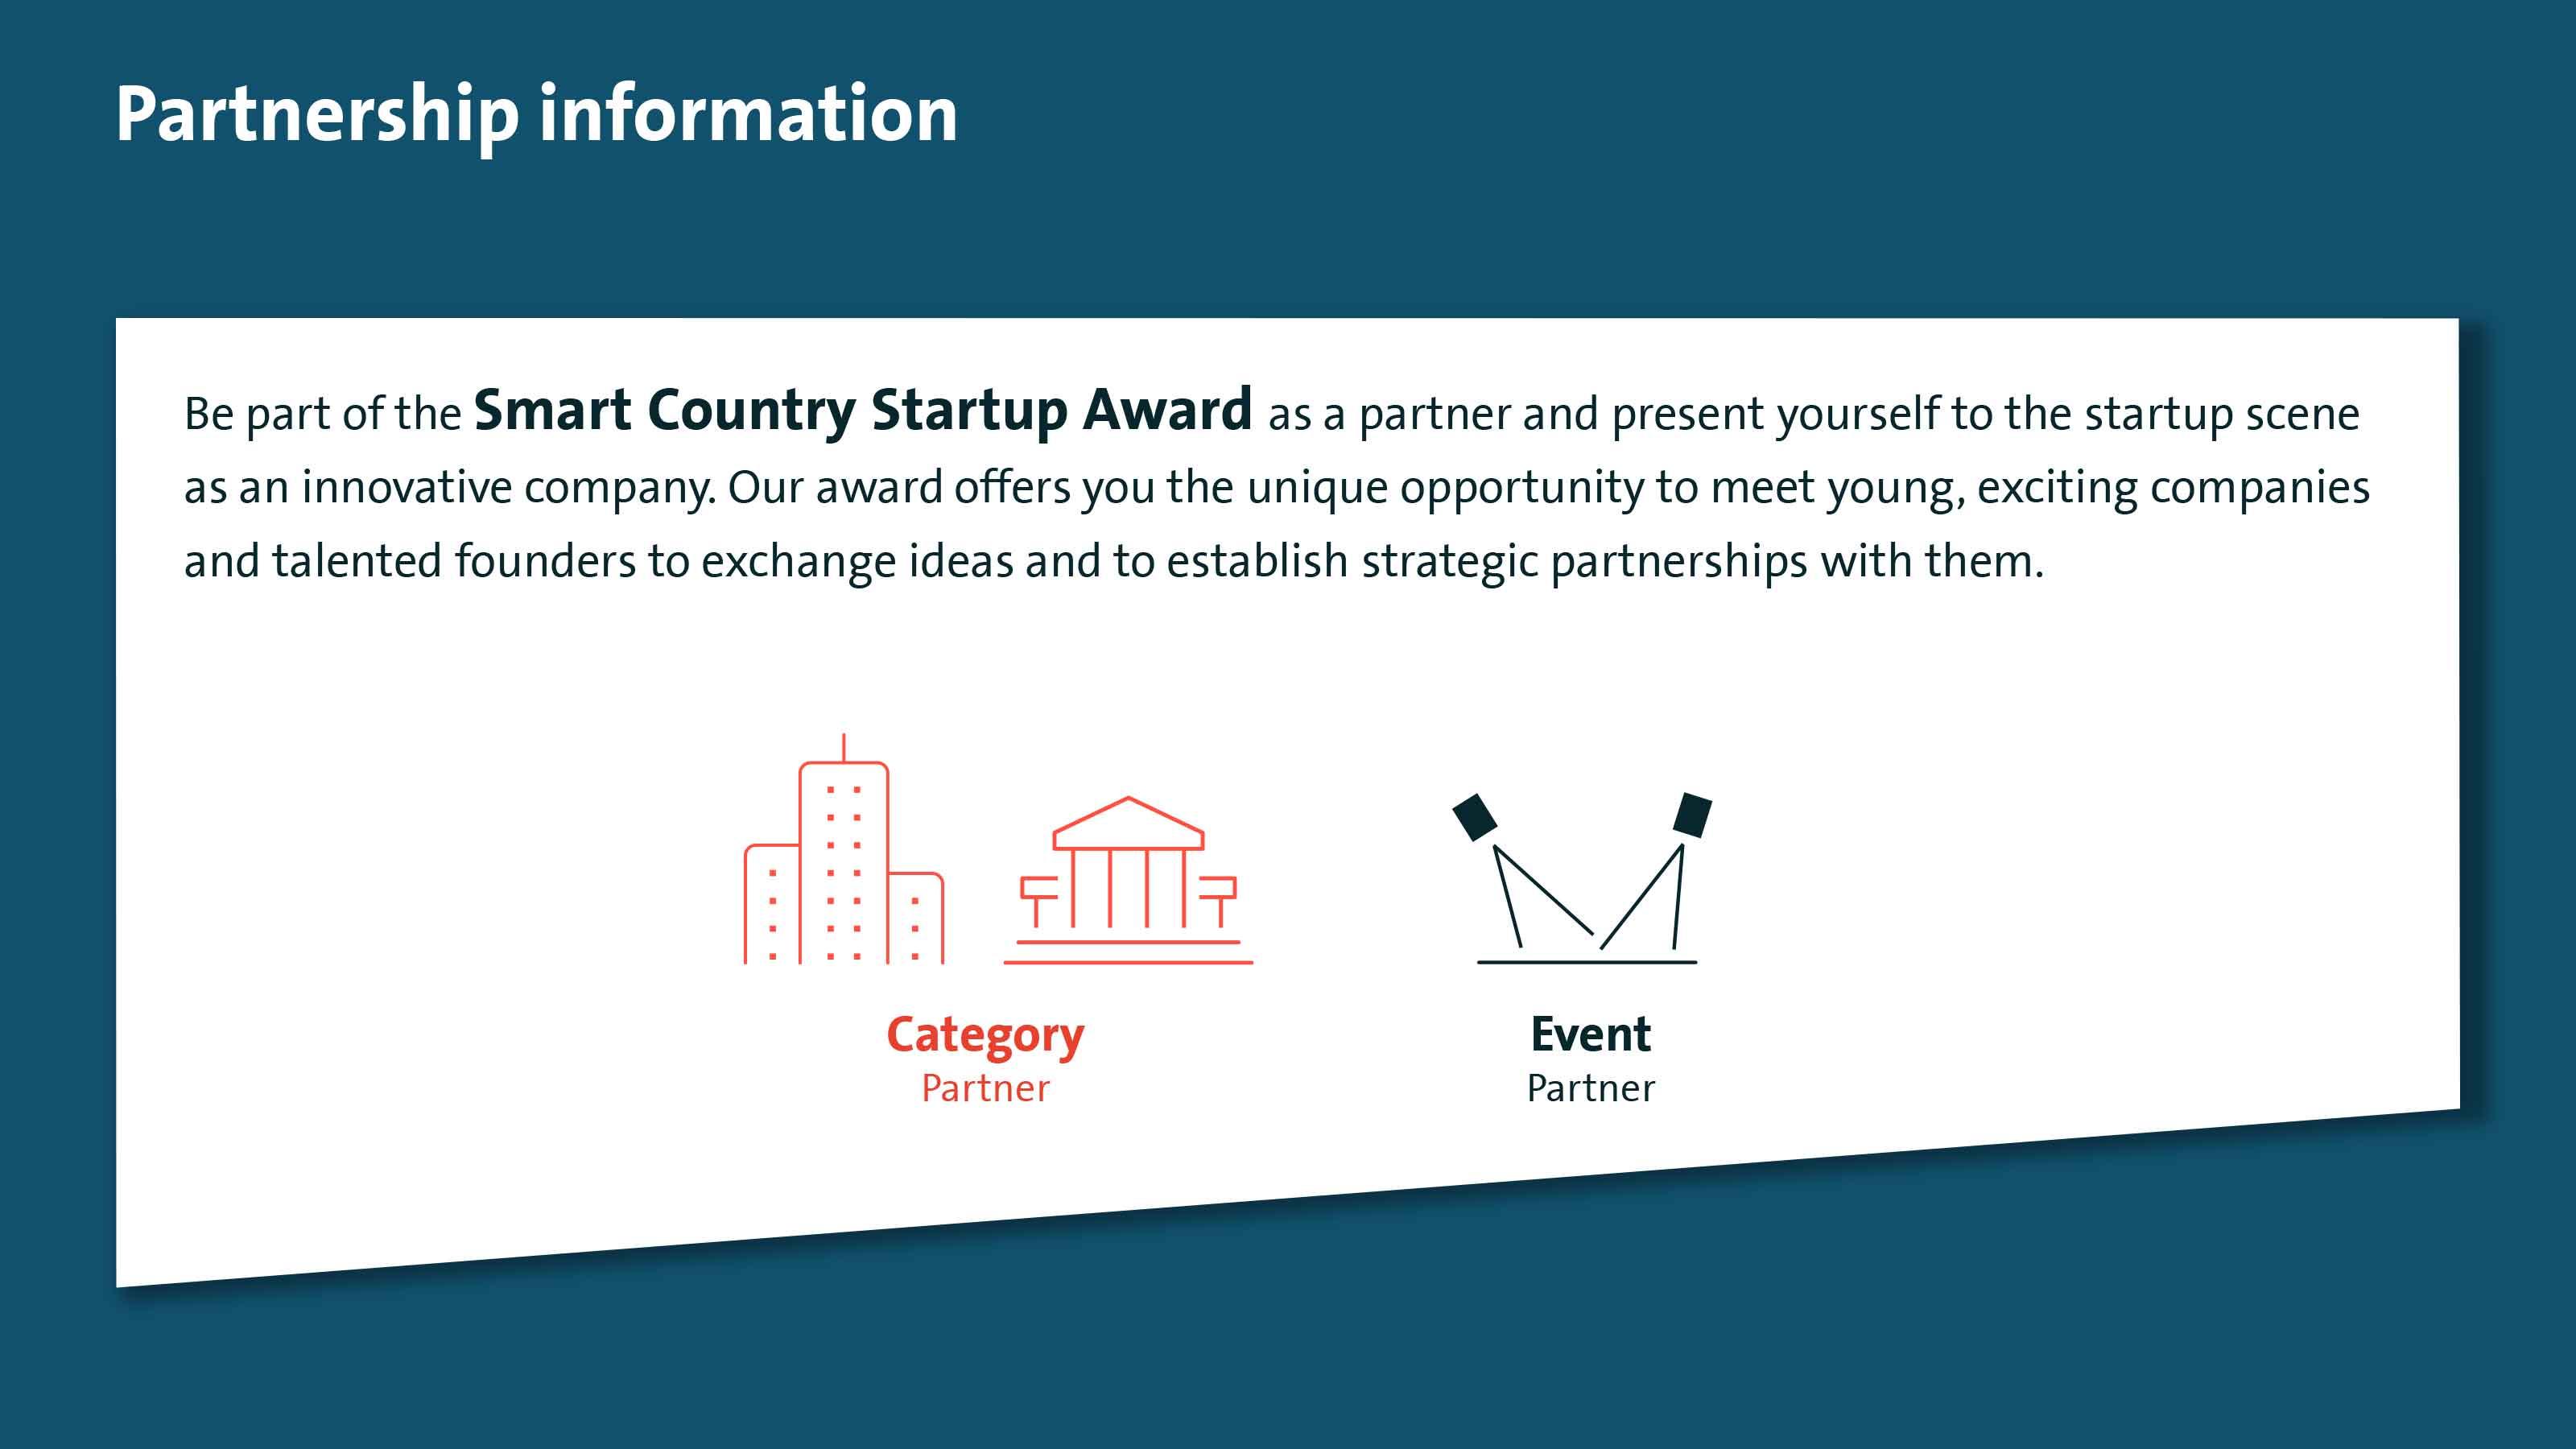 Partnership information